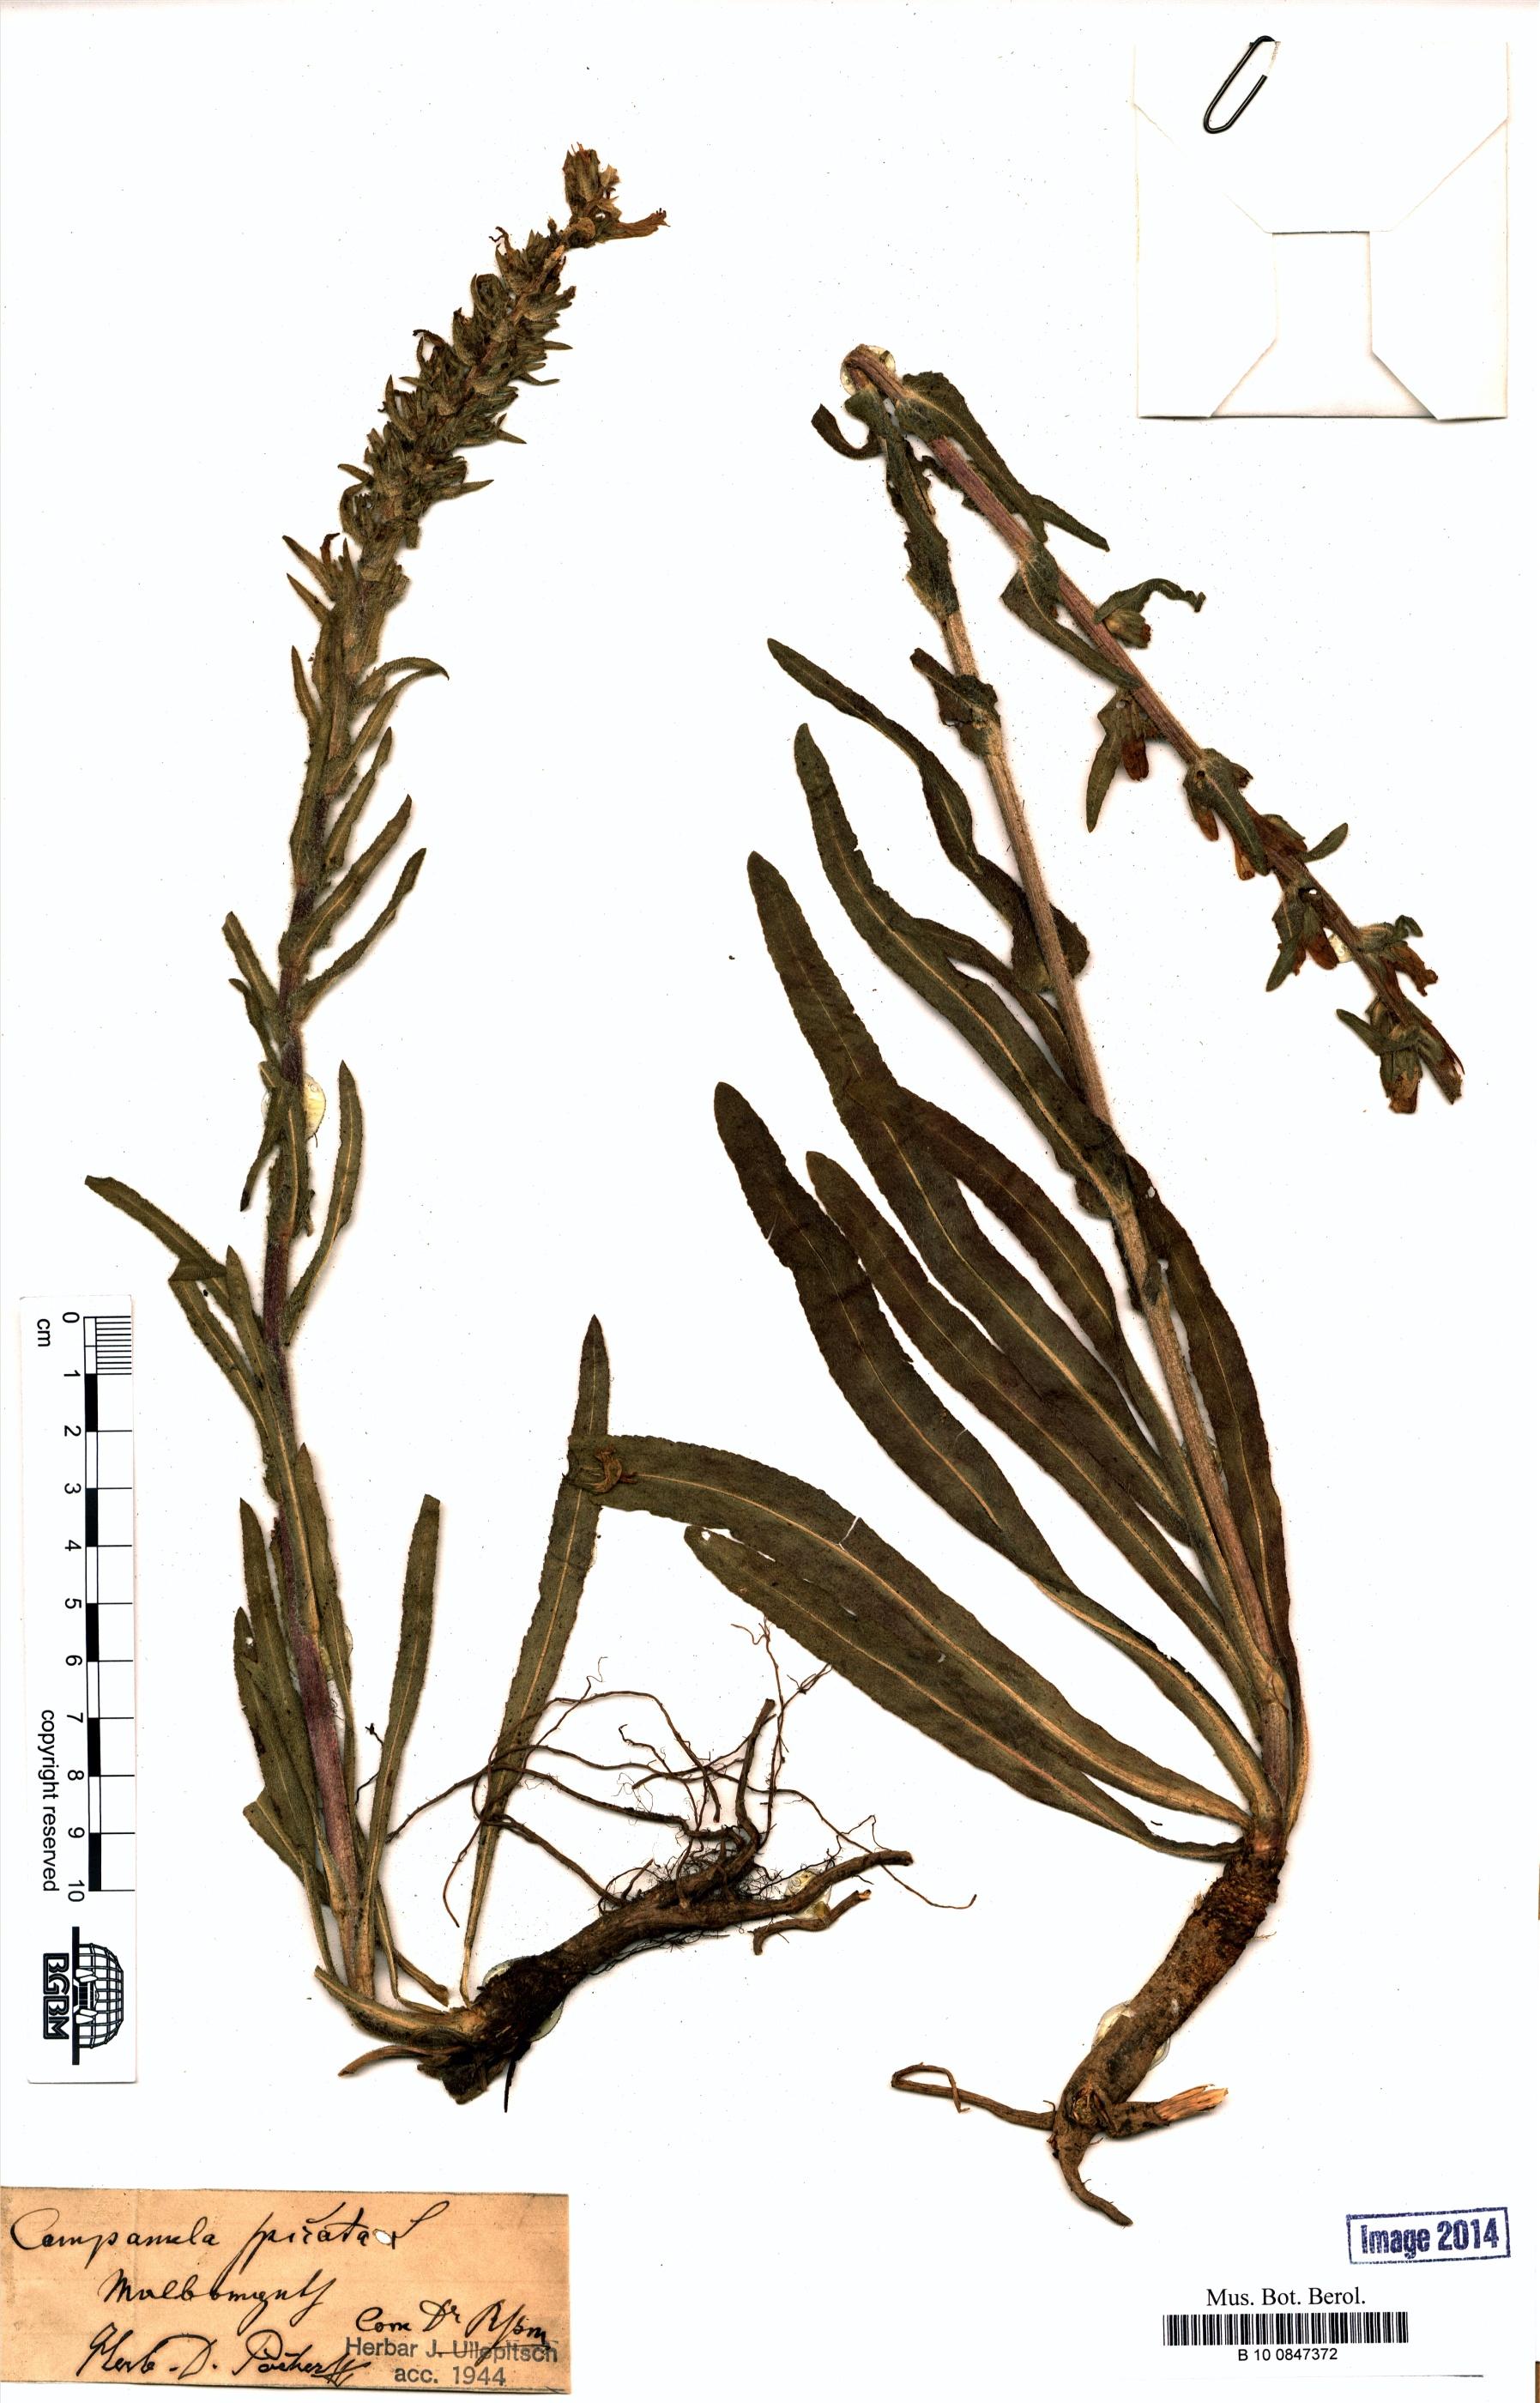 http://ww2.bgbm.org/herbarium/images/B/10/08/47/37/B_10_0847372.jpg